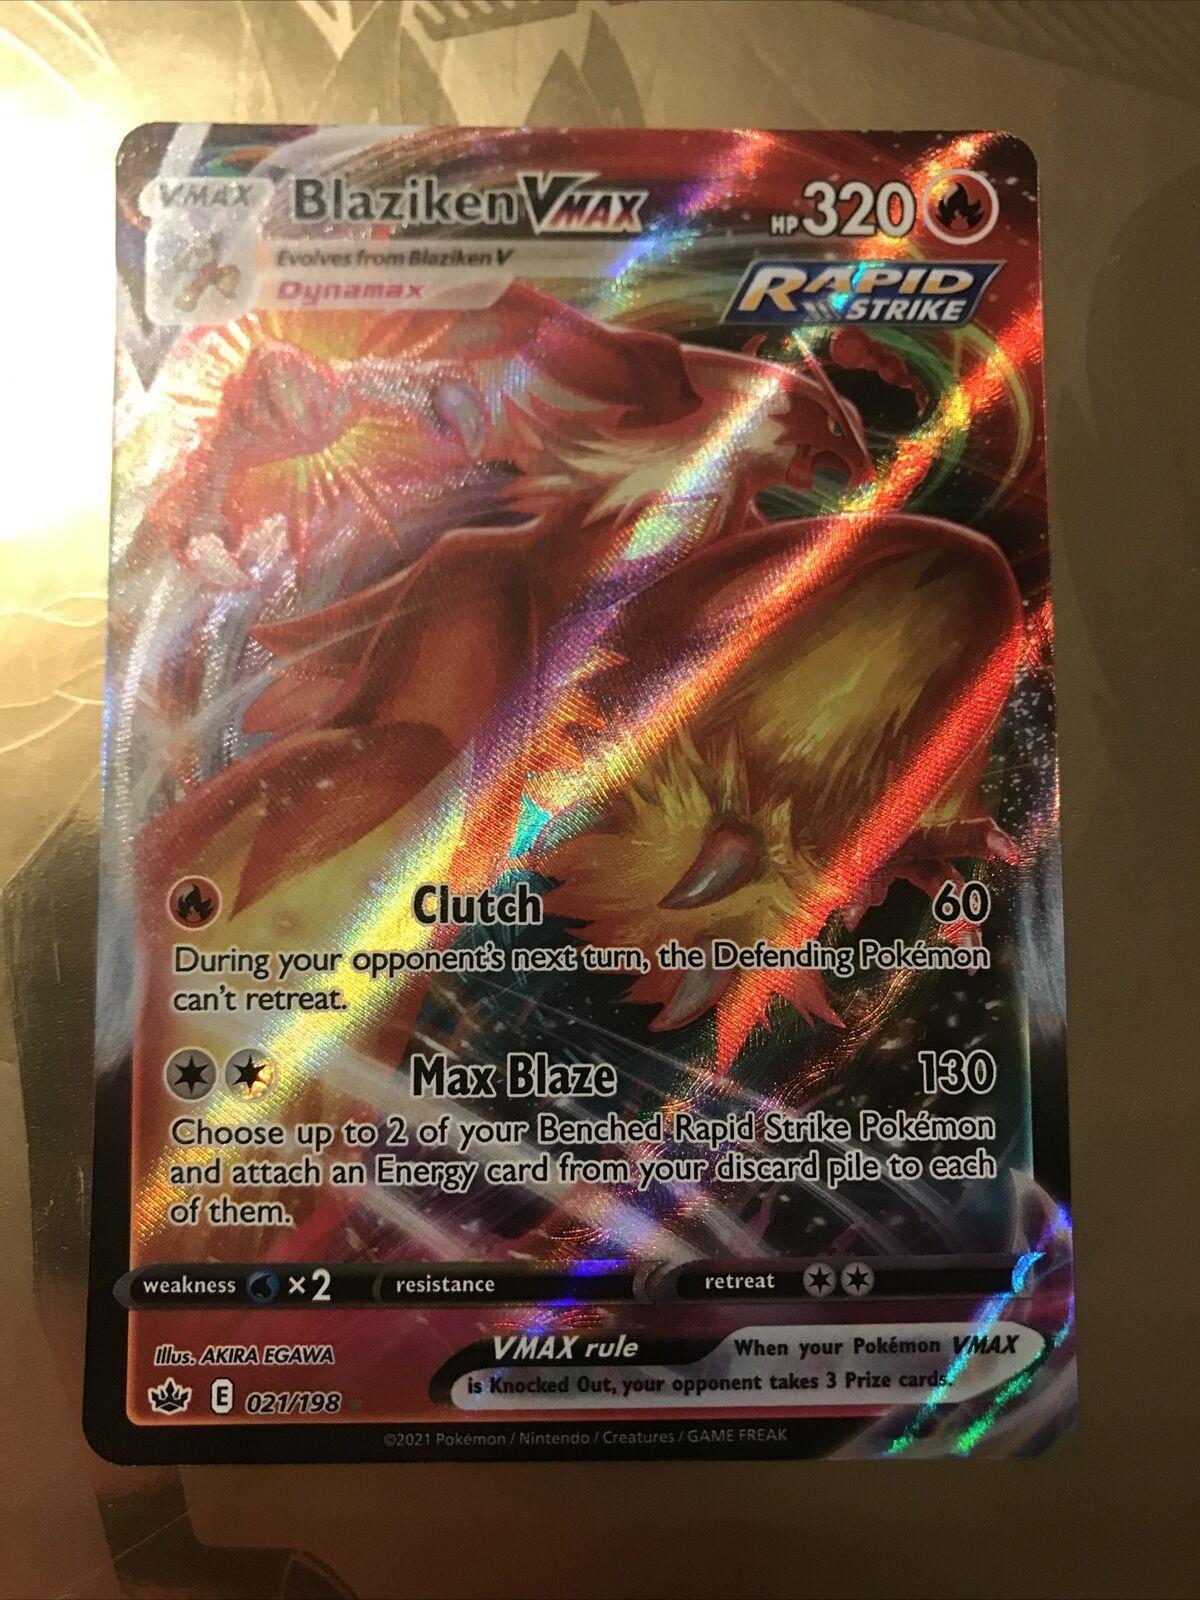 Blaziken VMAX 021/198 Pokémon TCG Chilling Reign Full Art Ultra Rare Near Mint - Image 1